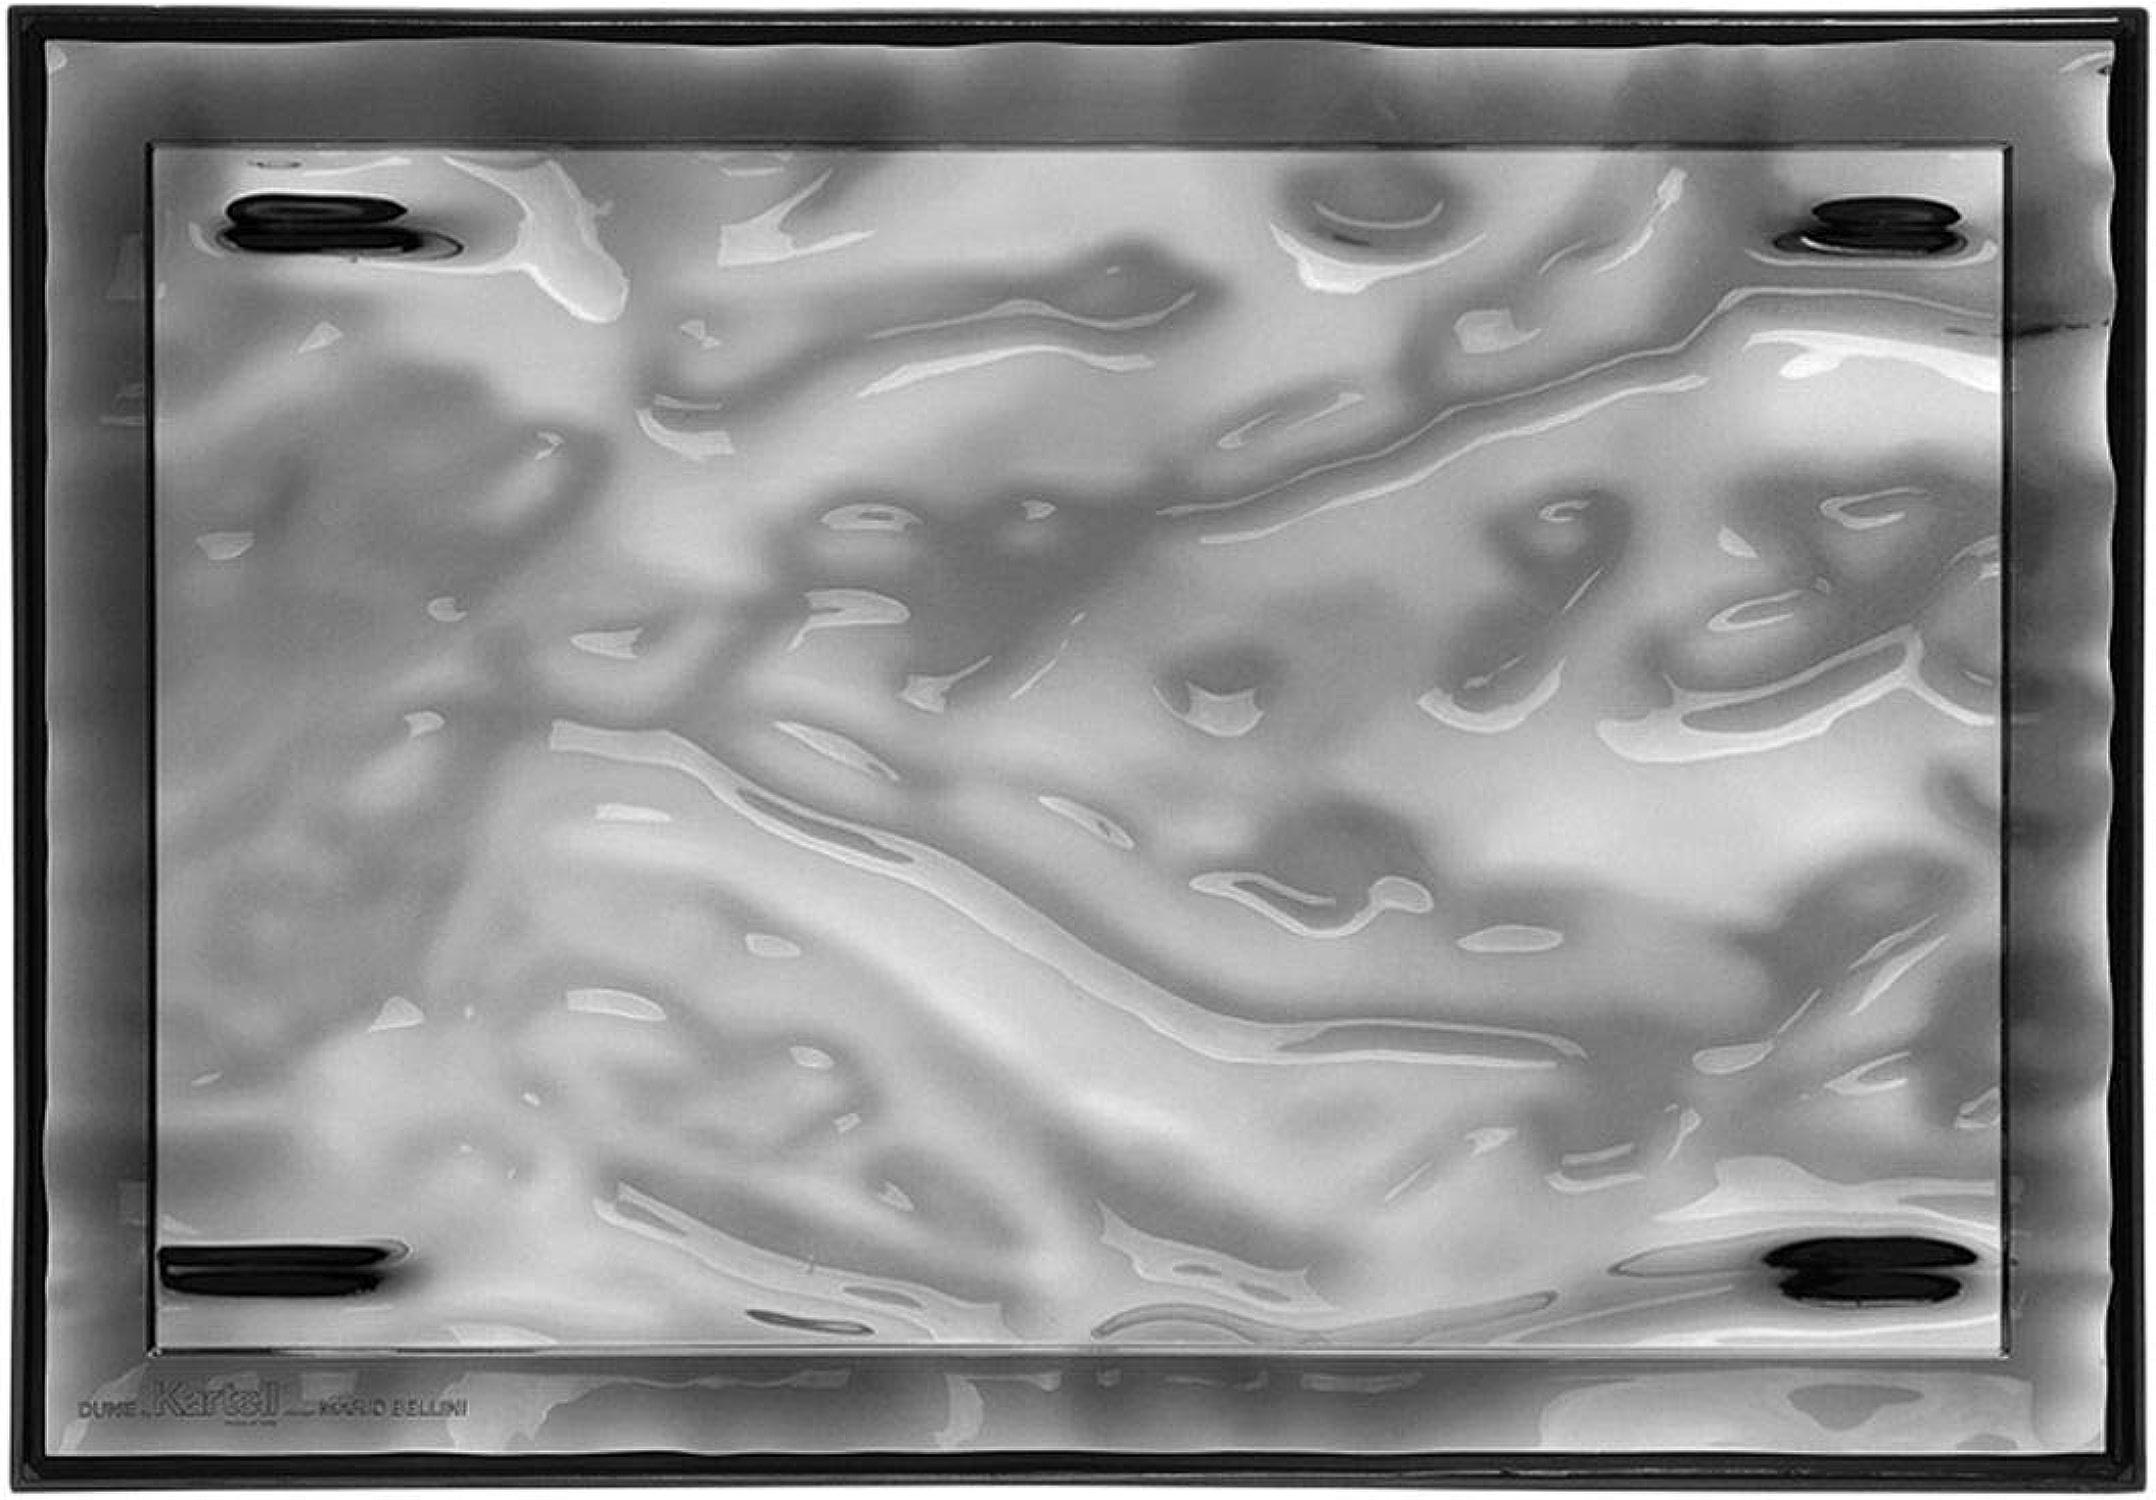 Kartell Plateau Dune grand, Plastique, Smoked, Piccolo